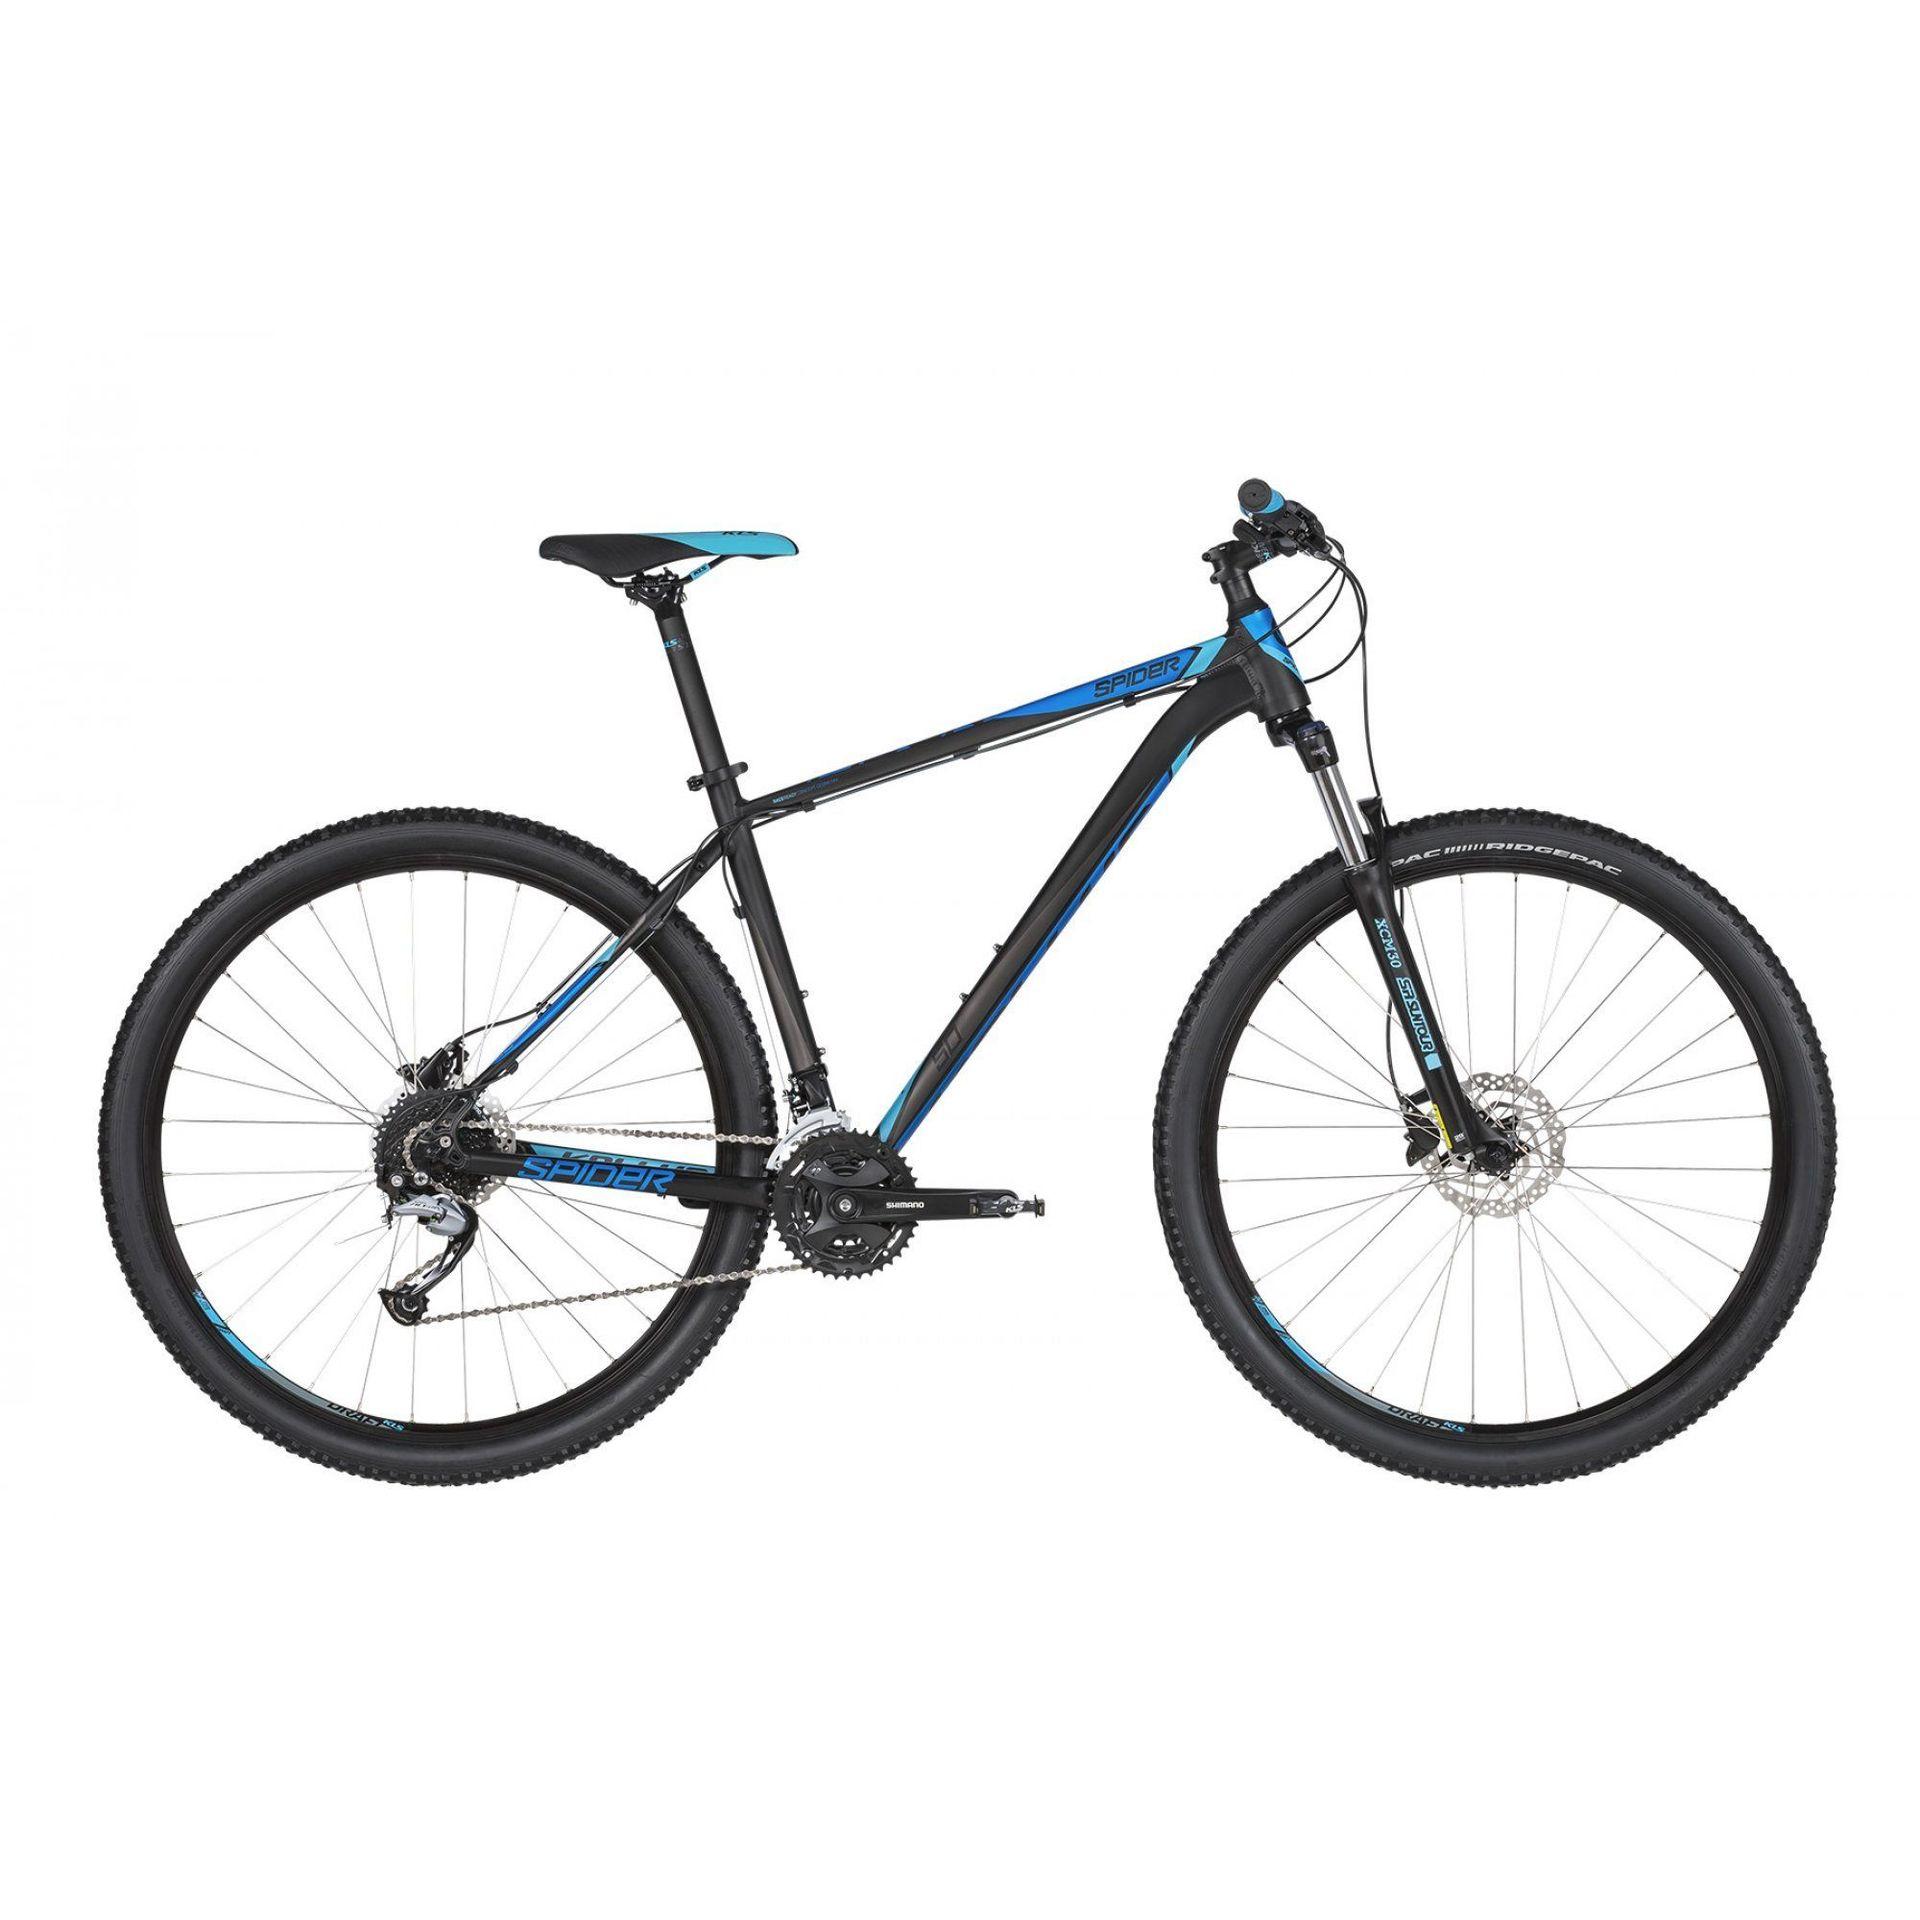 ROWER KELLYS SPIDER 50 BLACK|BLUE K19084